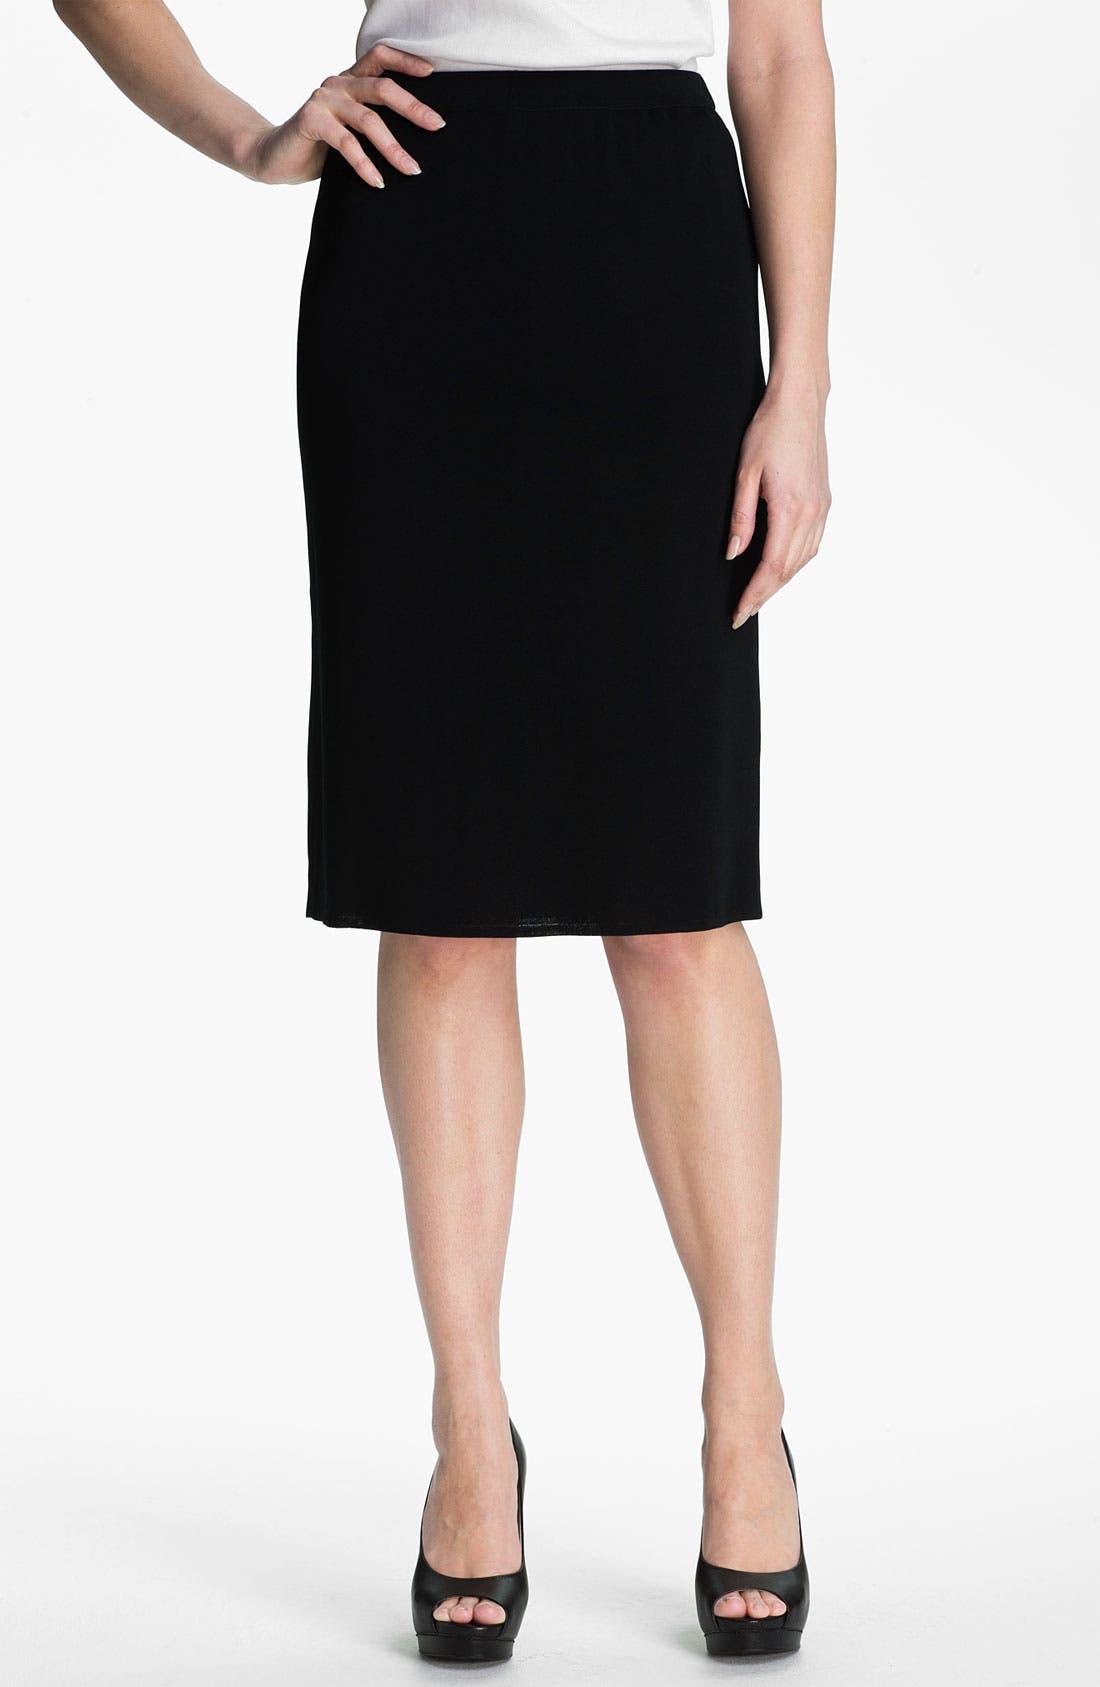 Ming Wang Black Skirts: A-Line, Pencil, Maxi, Miniskirts & More ...